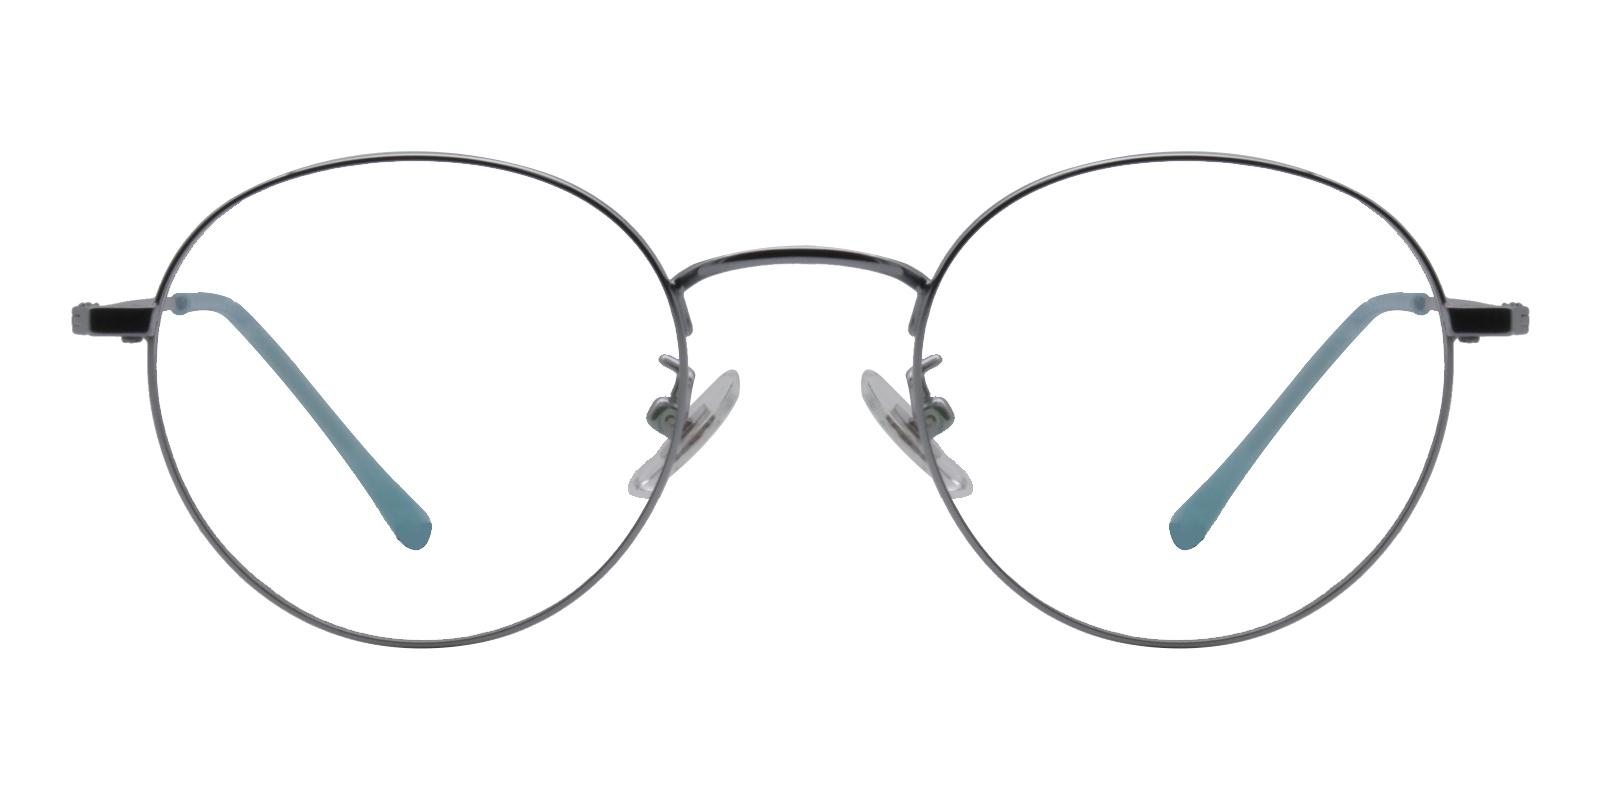 Peyton Blue Titanium NosePads , Eyeglasses , Lightweight Frames from ABBE Glasses